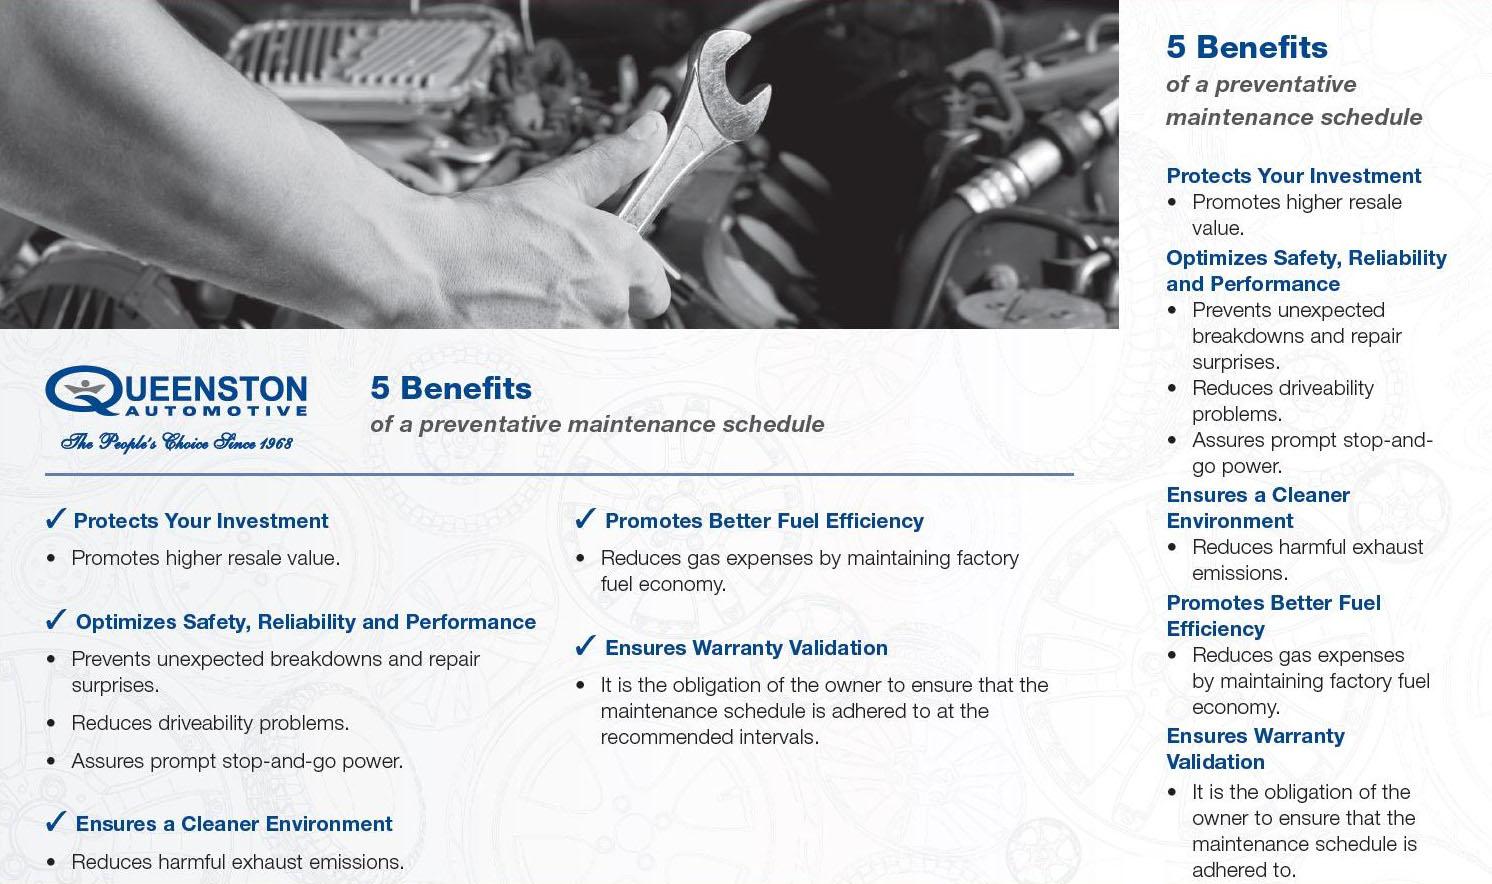 5_Benefits_of_Preventative_Maintenance_Schedule